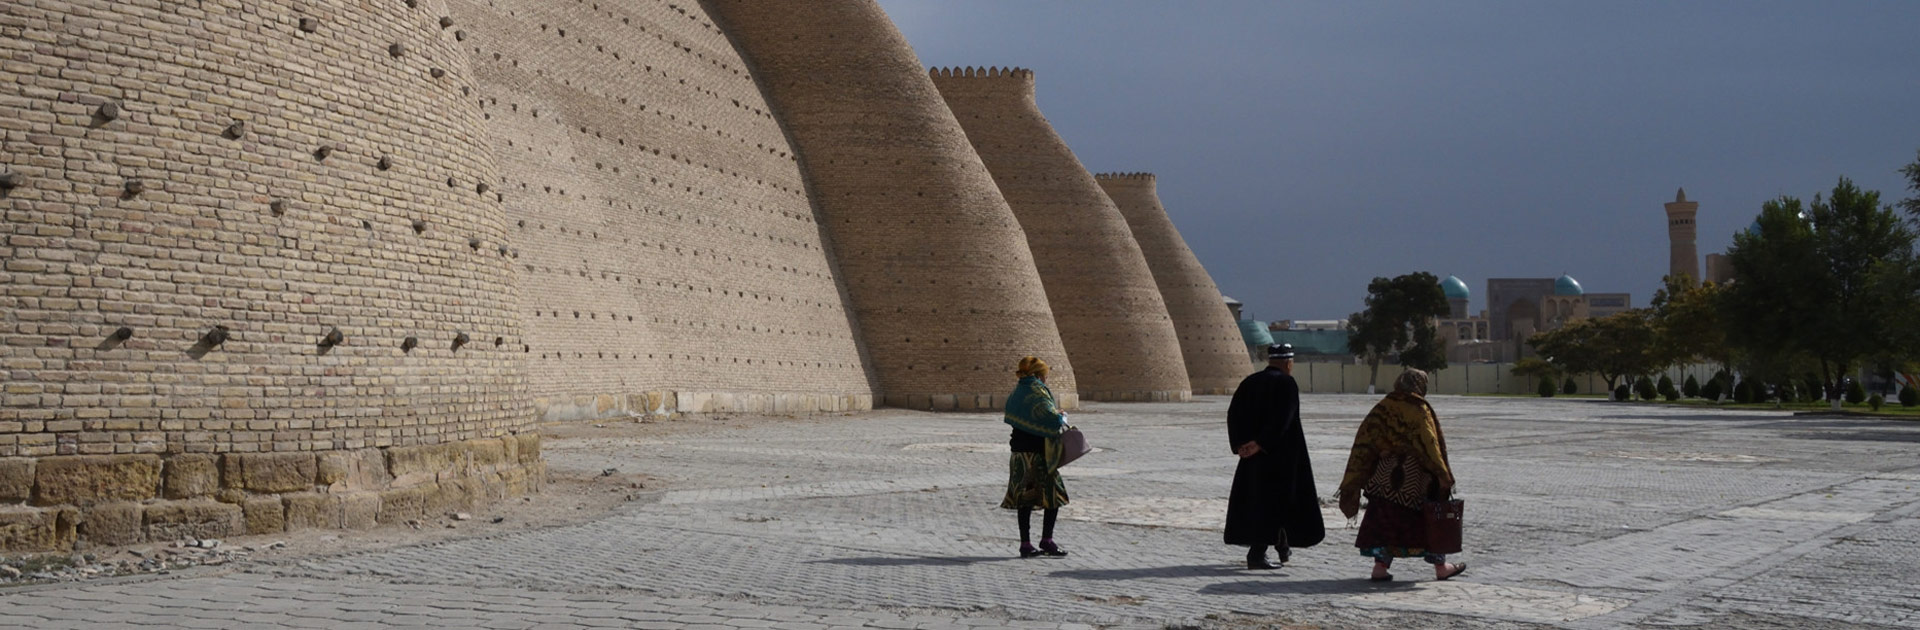 UZ Uzbekistán Espíritu del Pasado 8 días 1